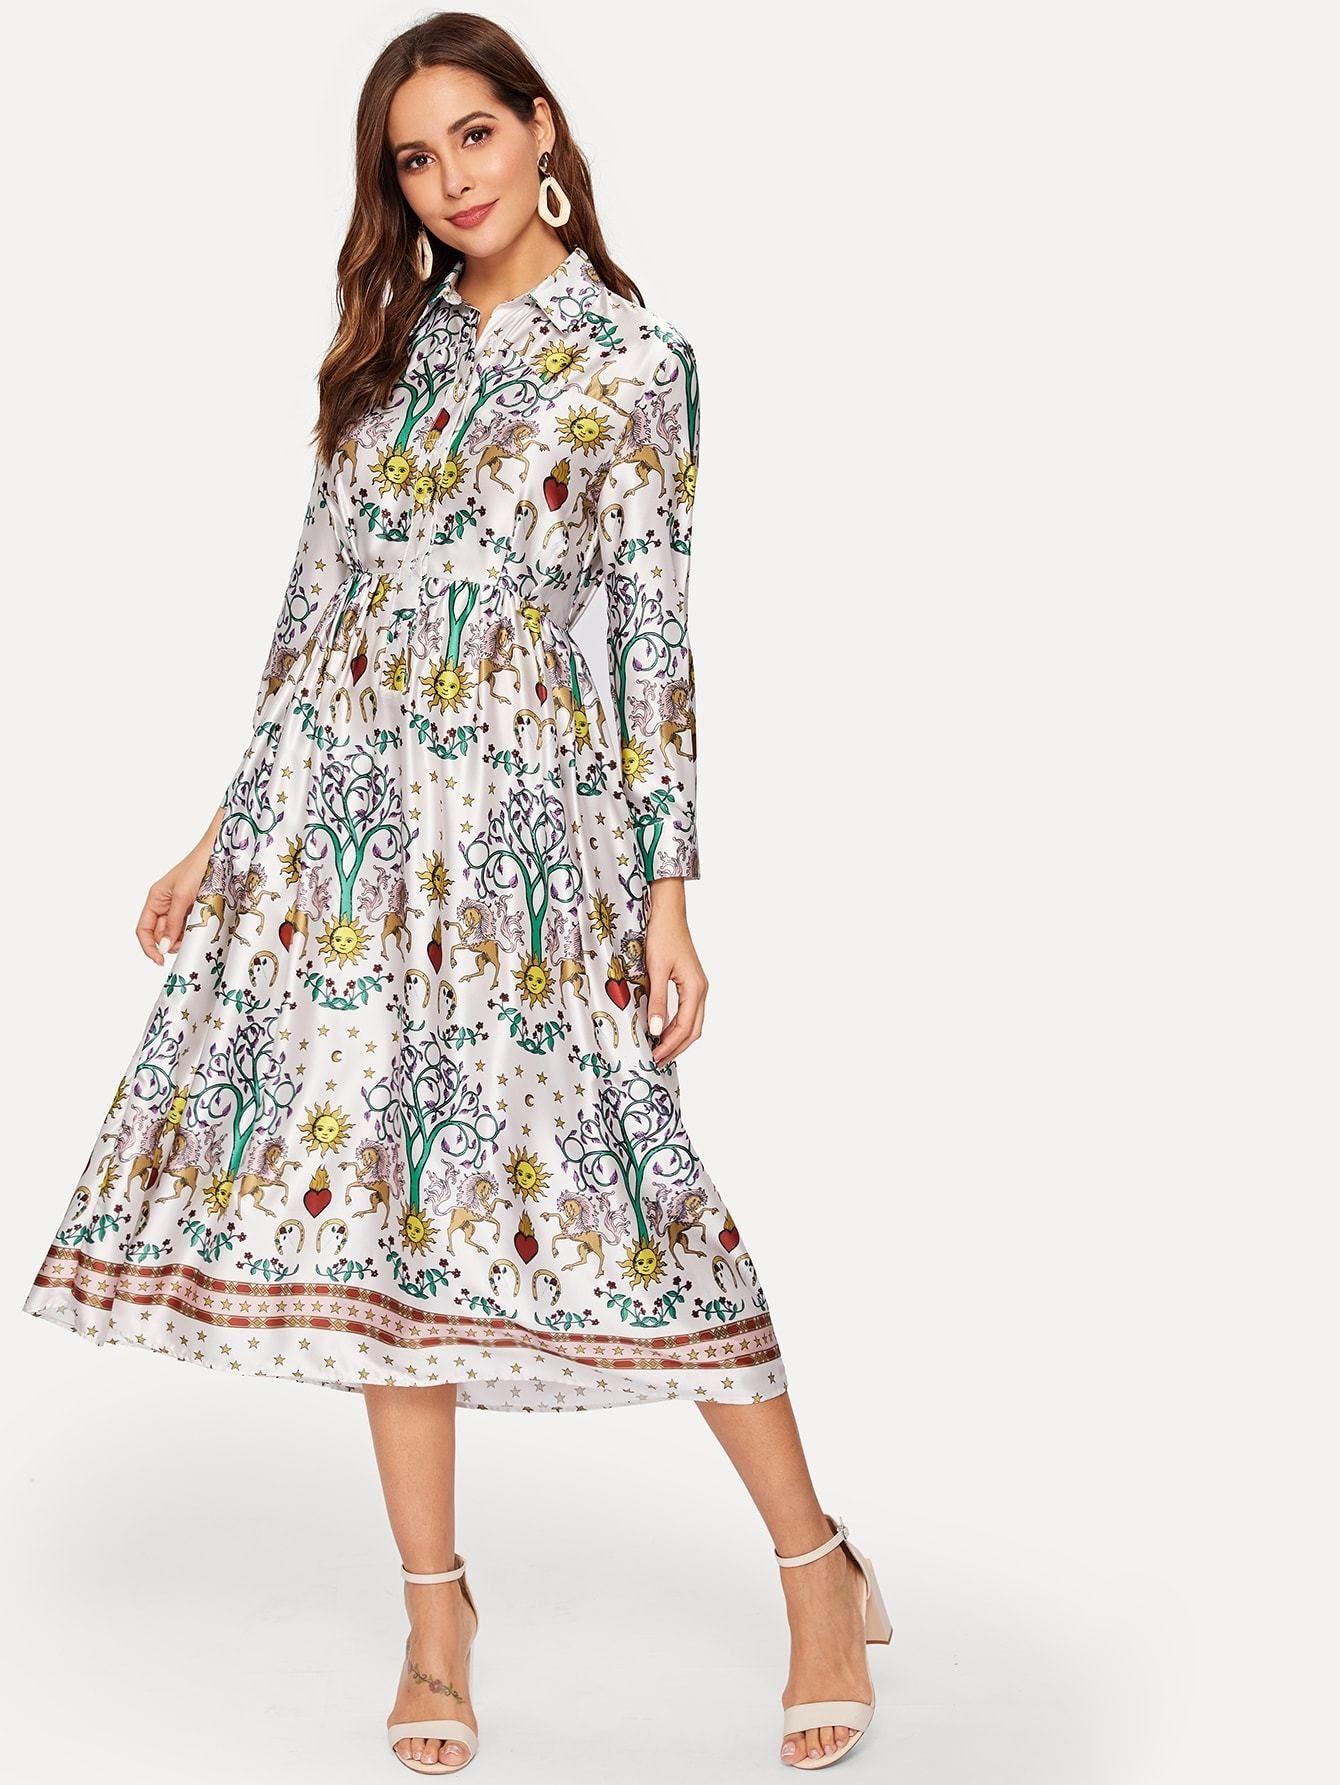 4dc6995fec cartoon and plants print shirt dress.  dresses  clothing  women  fashion